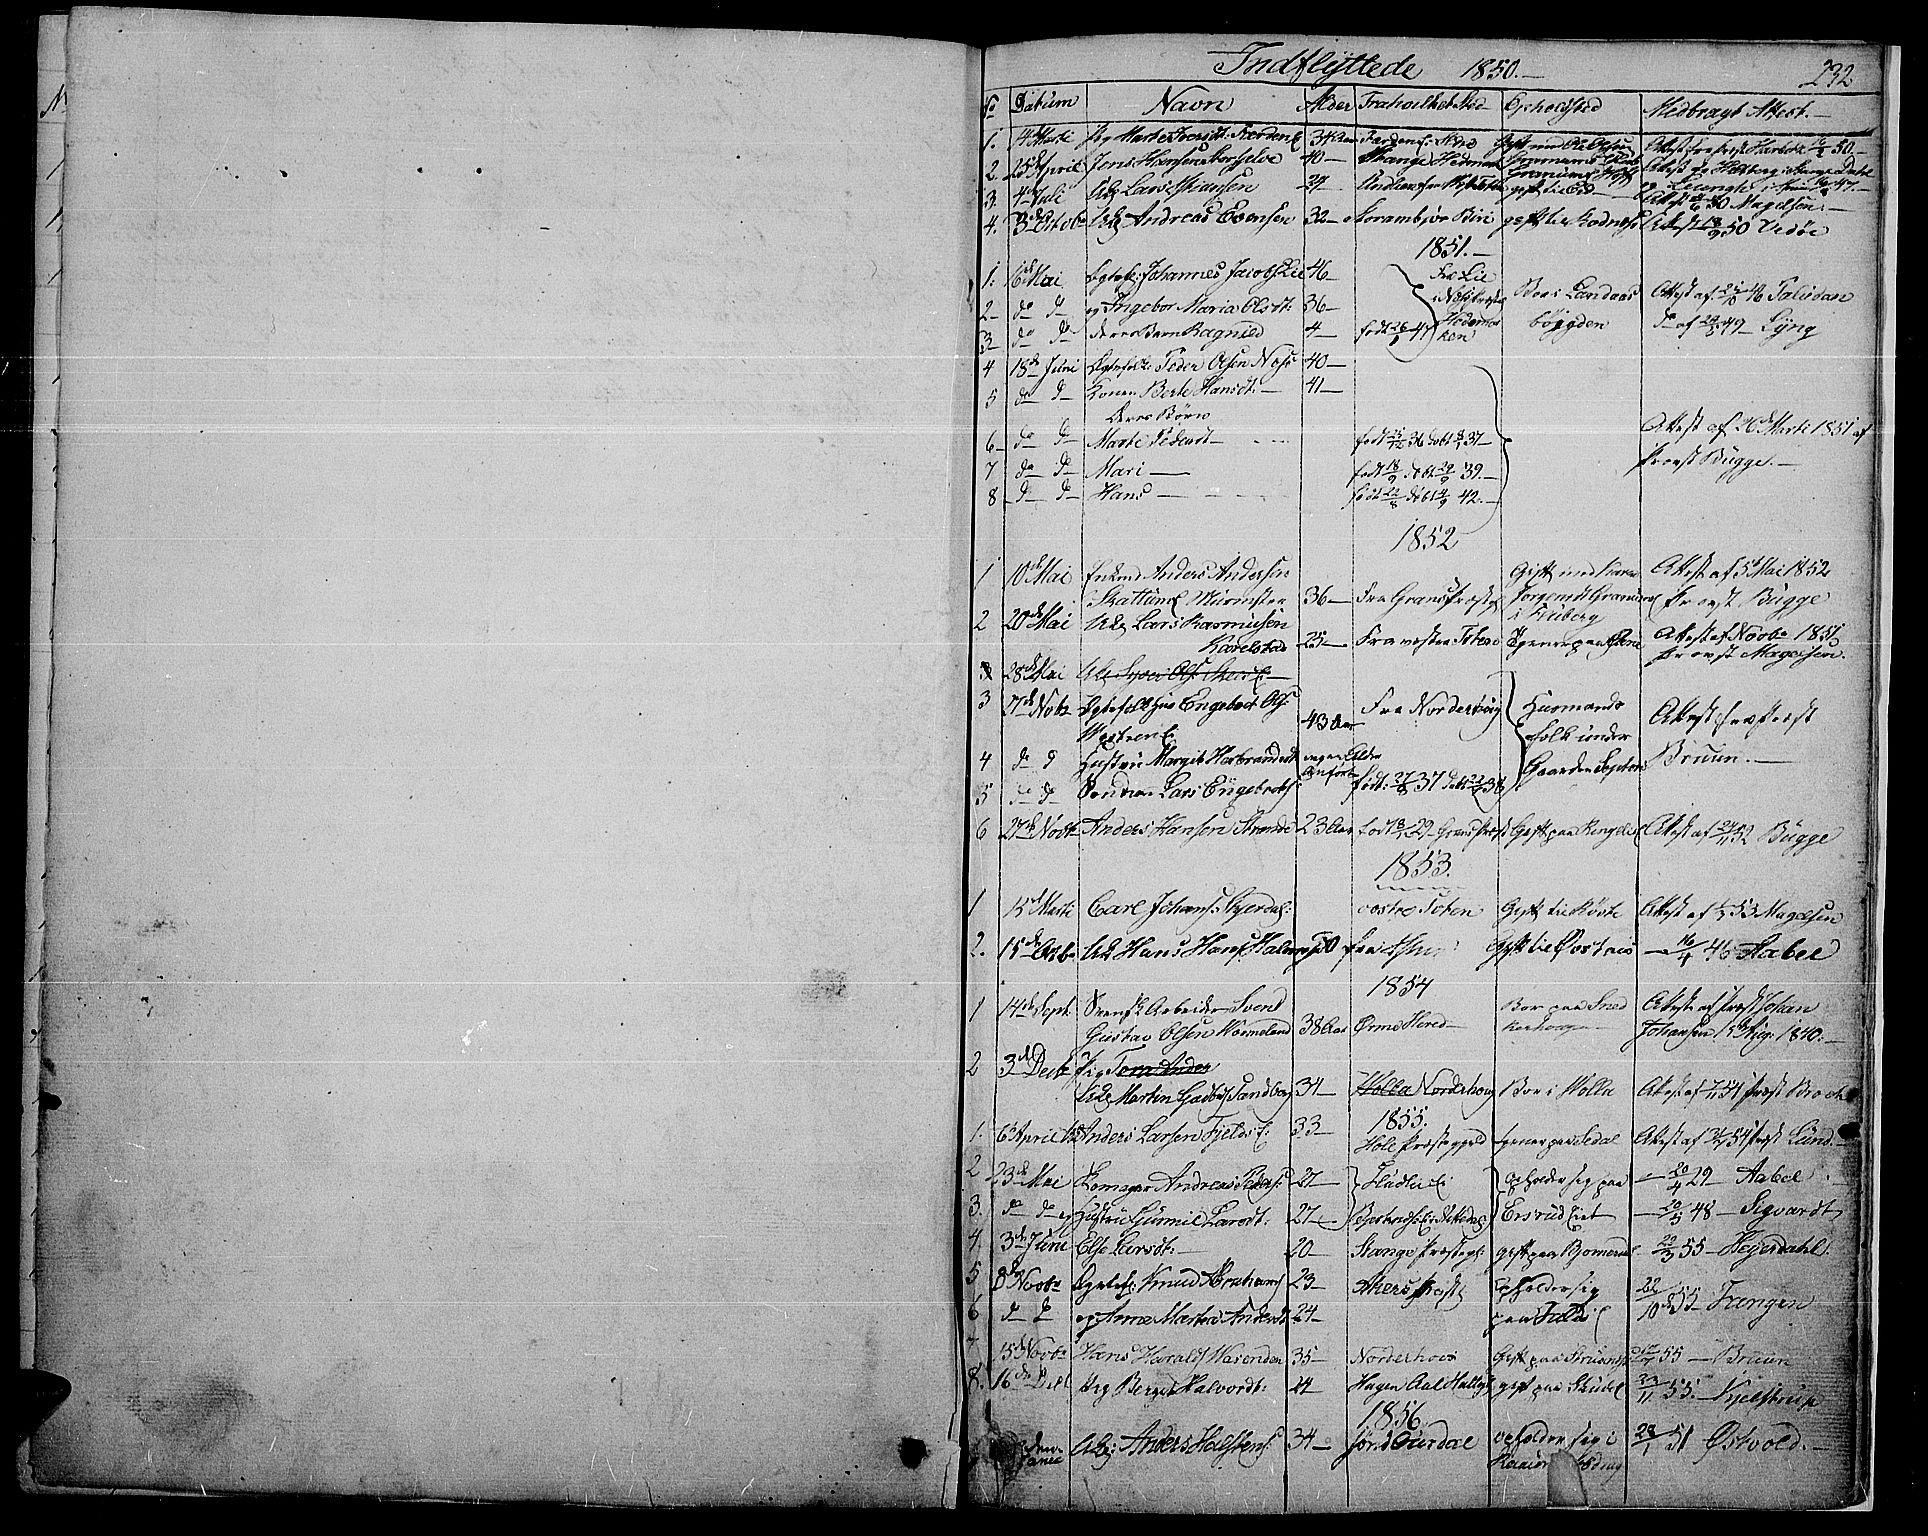 SAH, Søndre Land prestekontor, L/L0001: Klokkerbok nr. 1, 1849-1883, s. 232